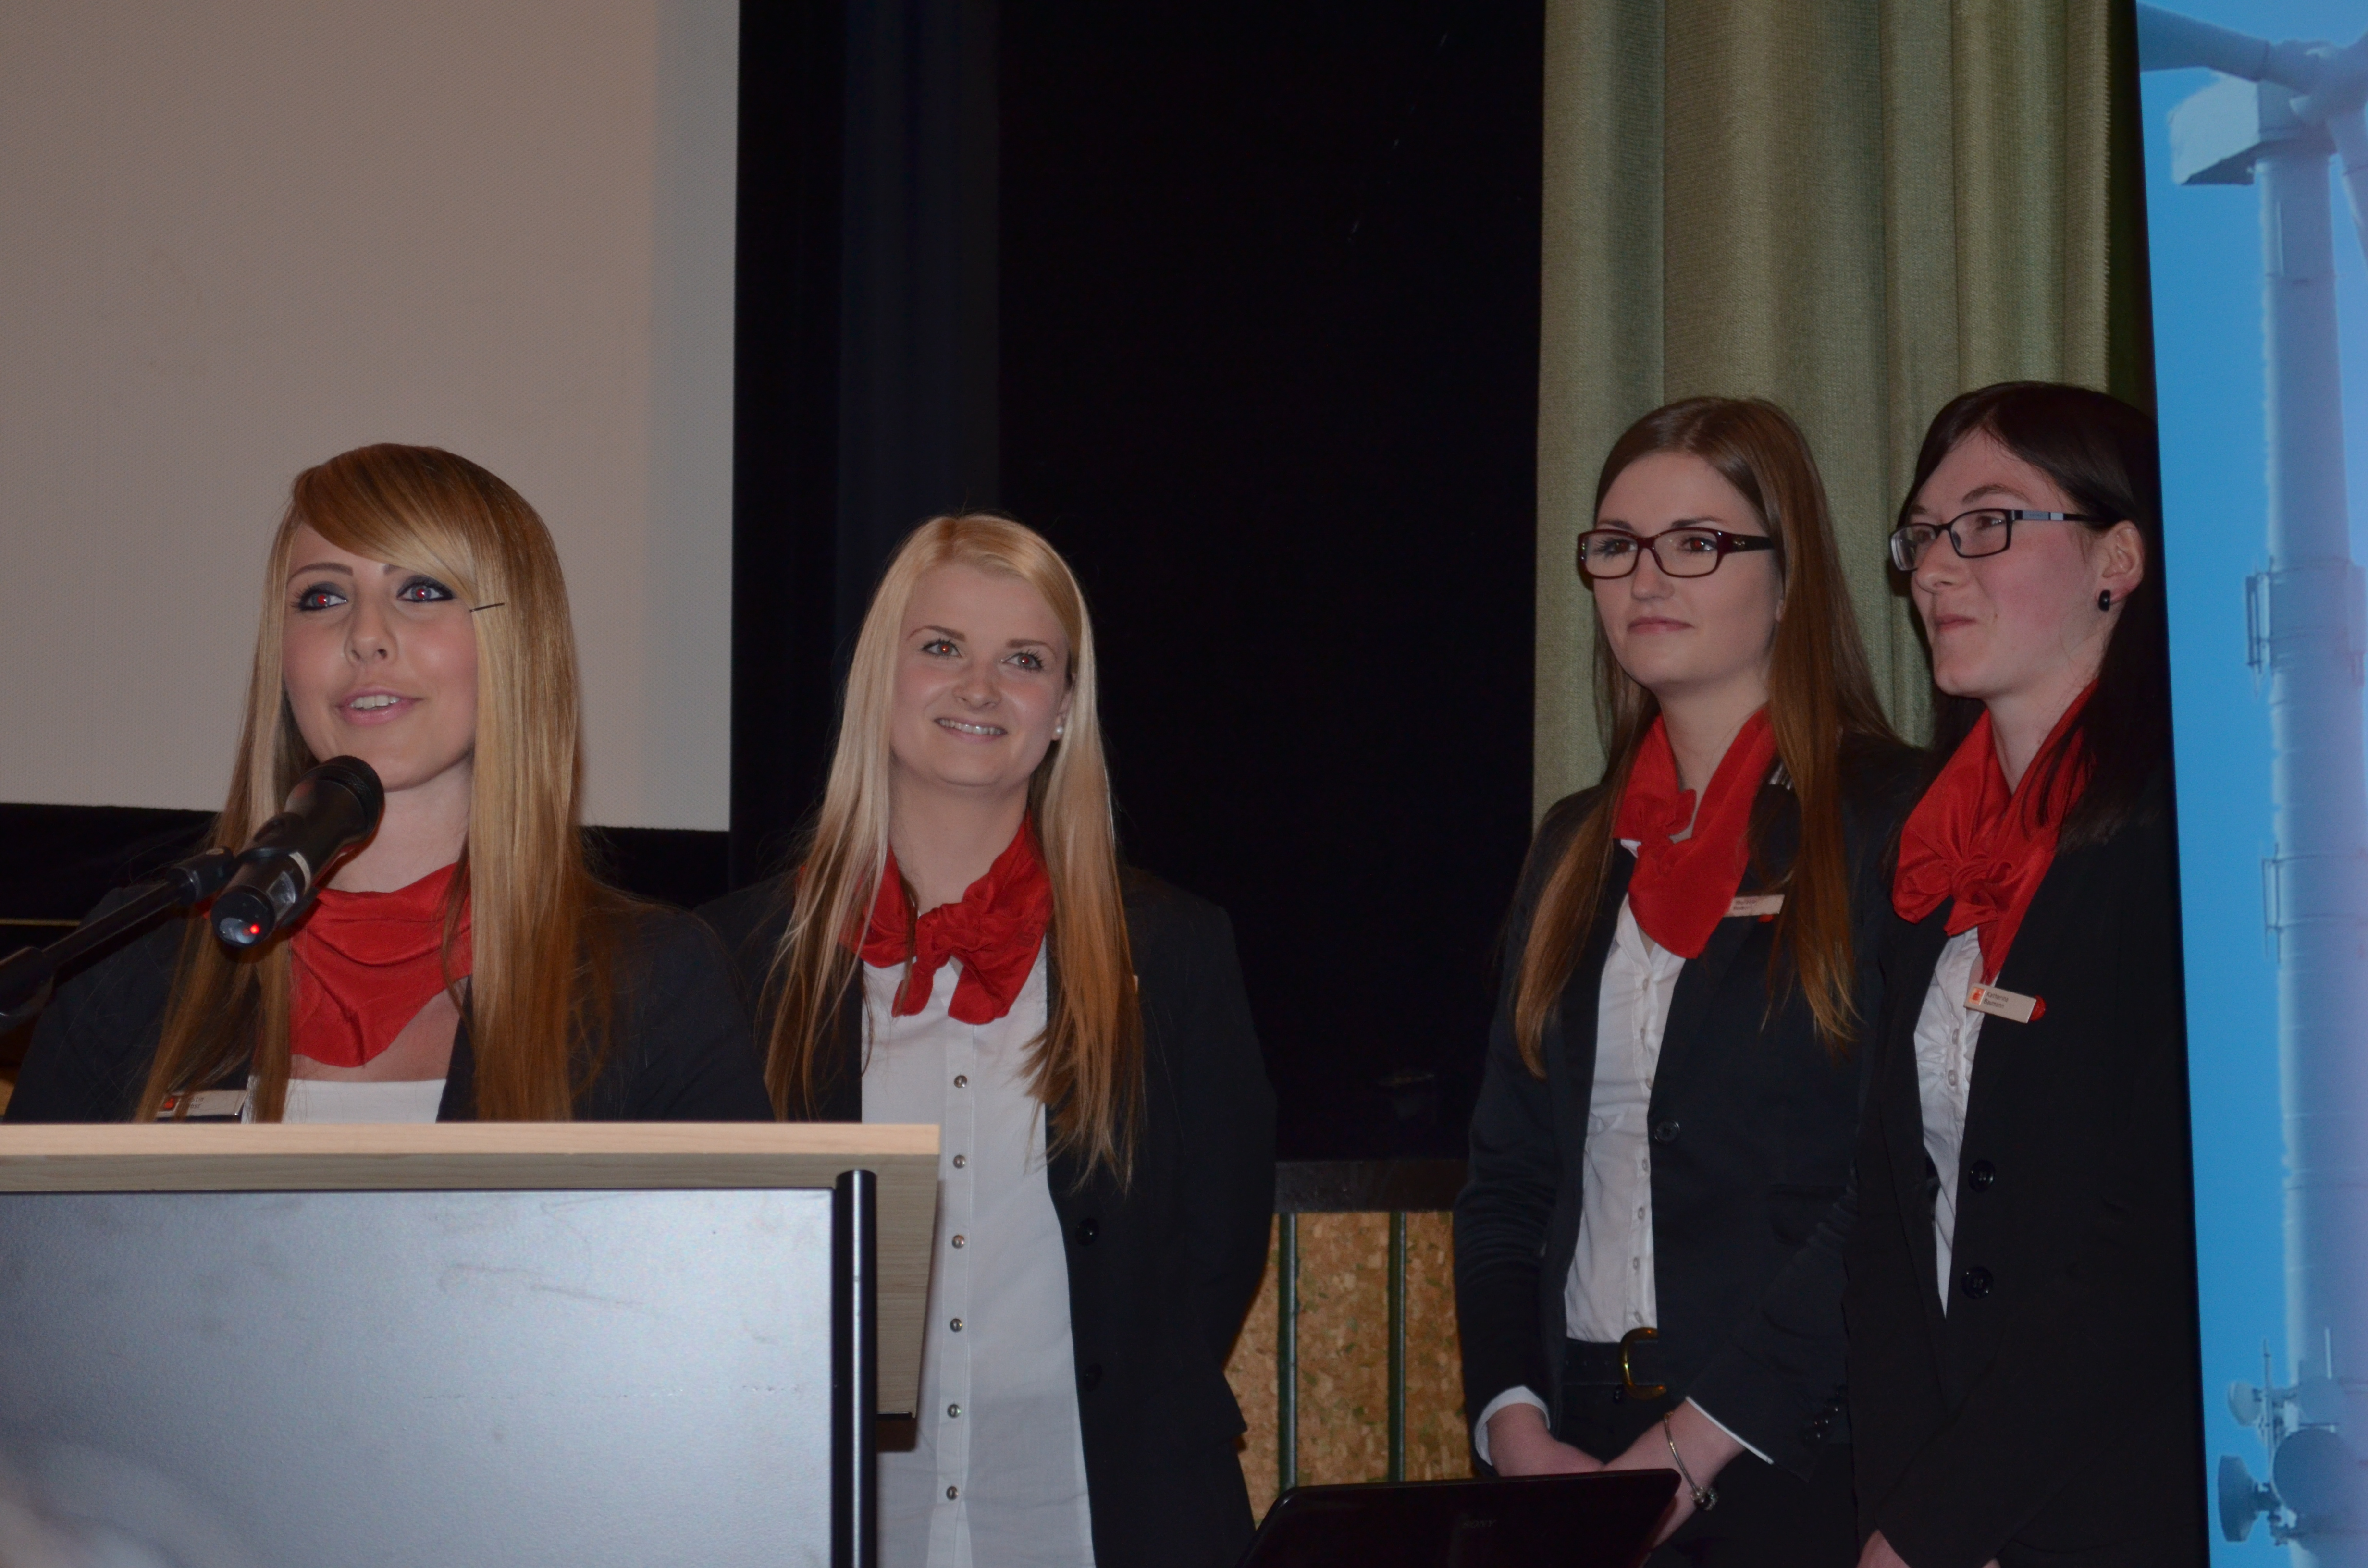 Kristin Herbst, Theresia Herborn, Jennifer Natalie Steinbacher, Katharina Baumann